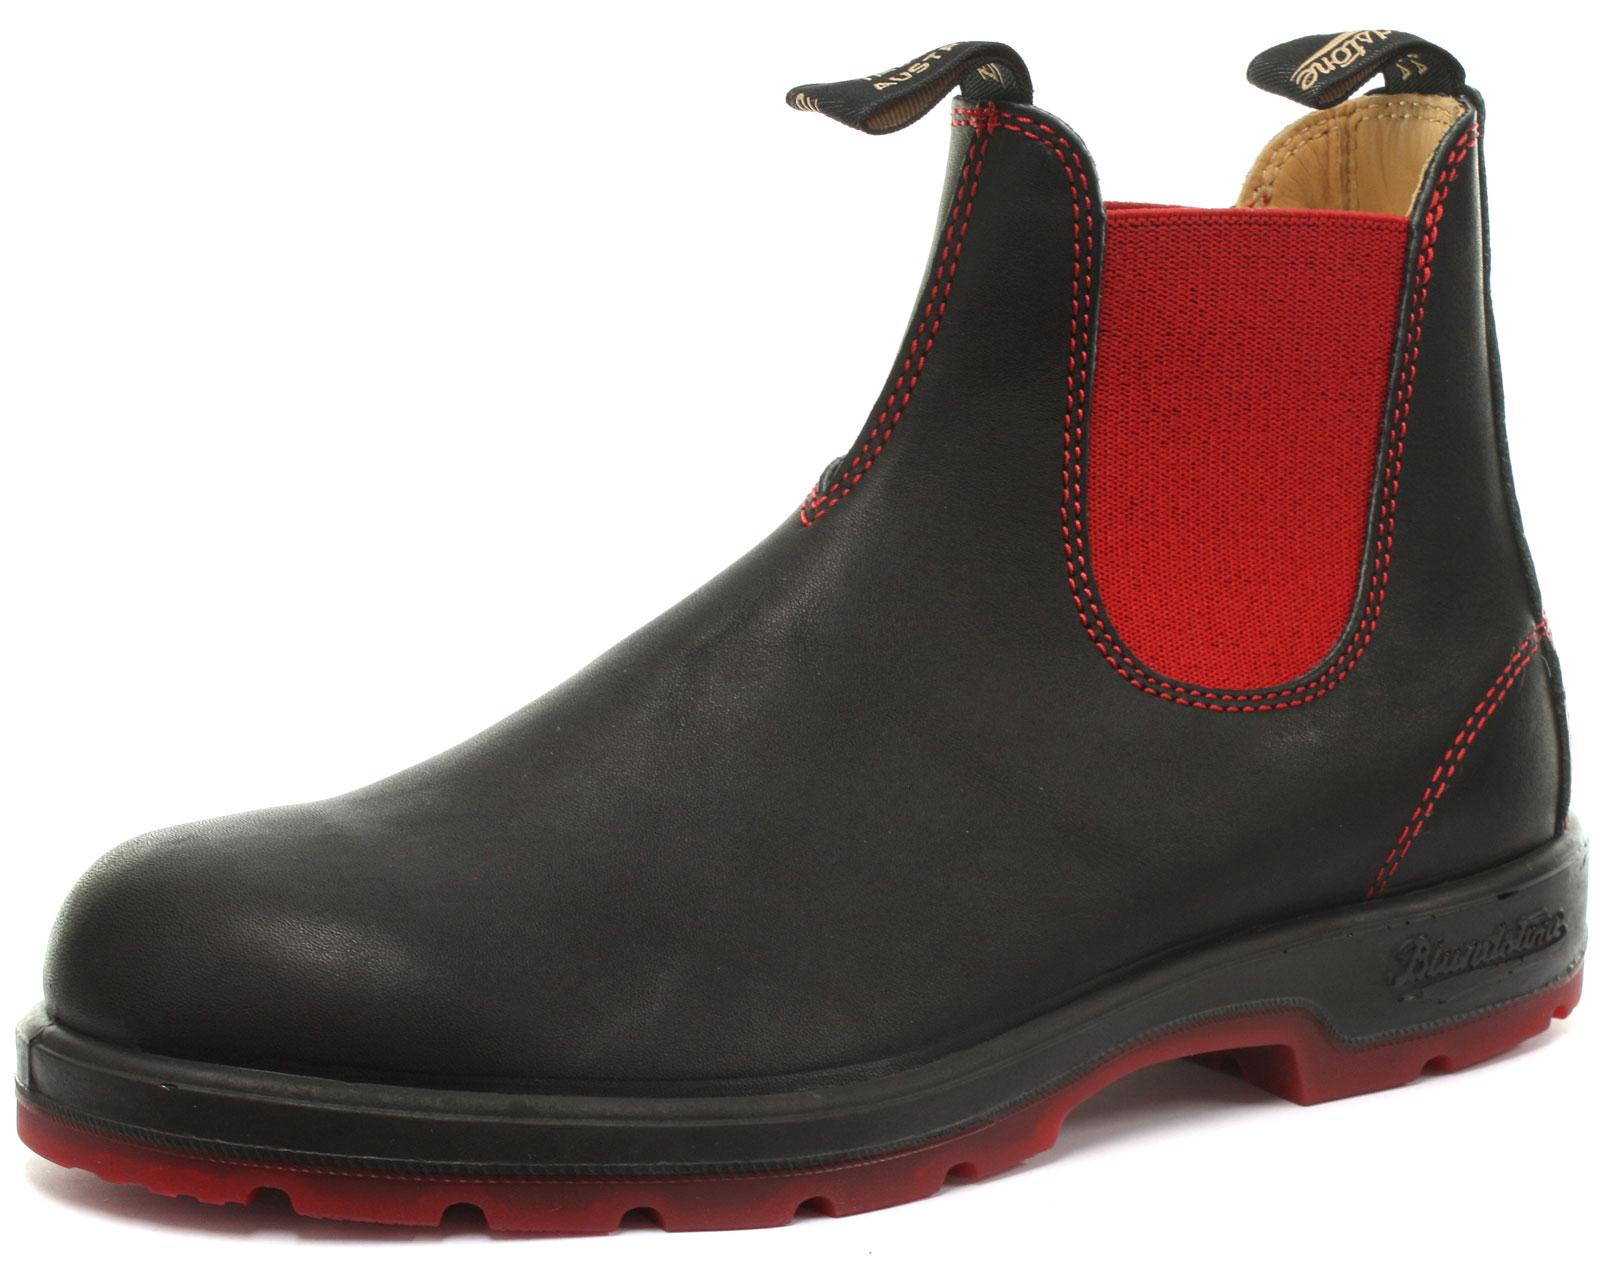 Blundstone 1316/1403 Leder Unisex Chelsea COLOURS Stiefel ALL SIZES AND COLOURS Chelsea 9bd808